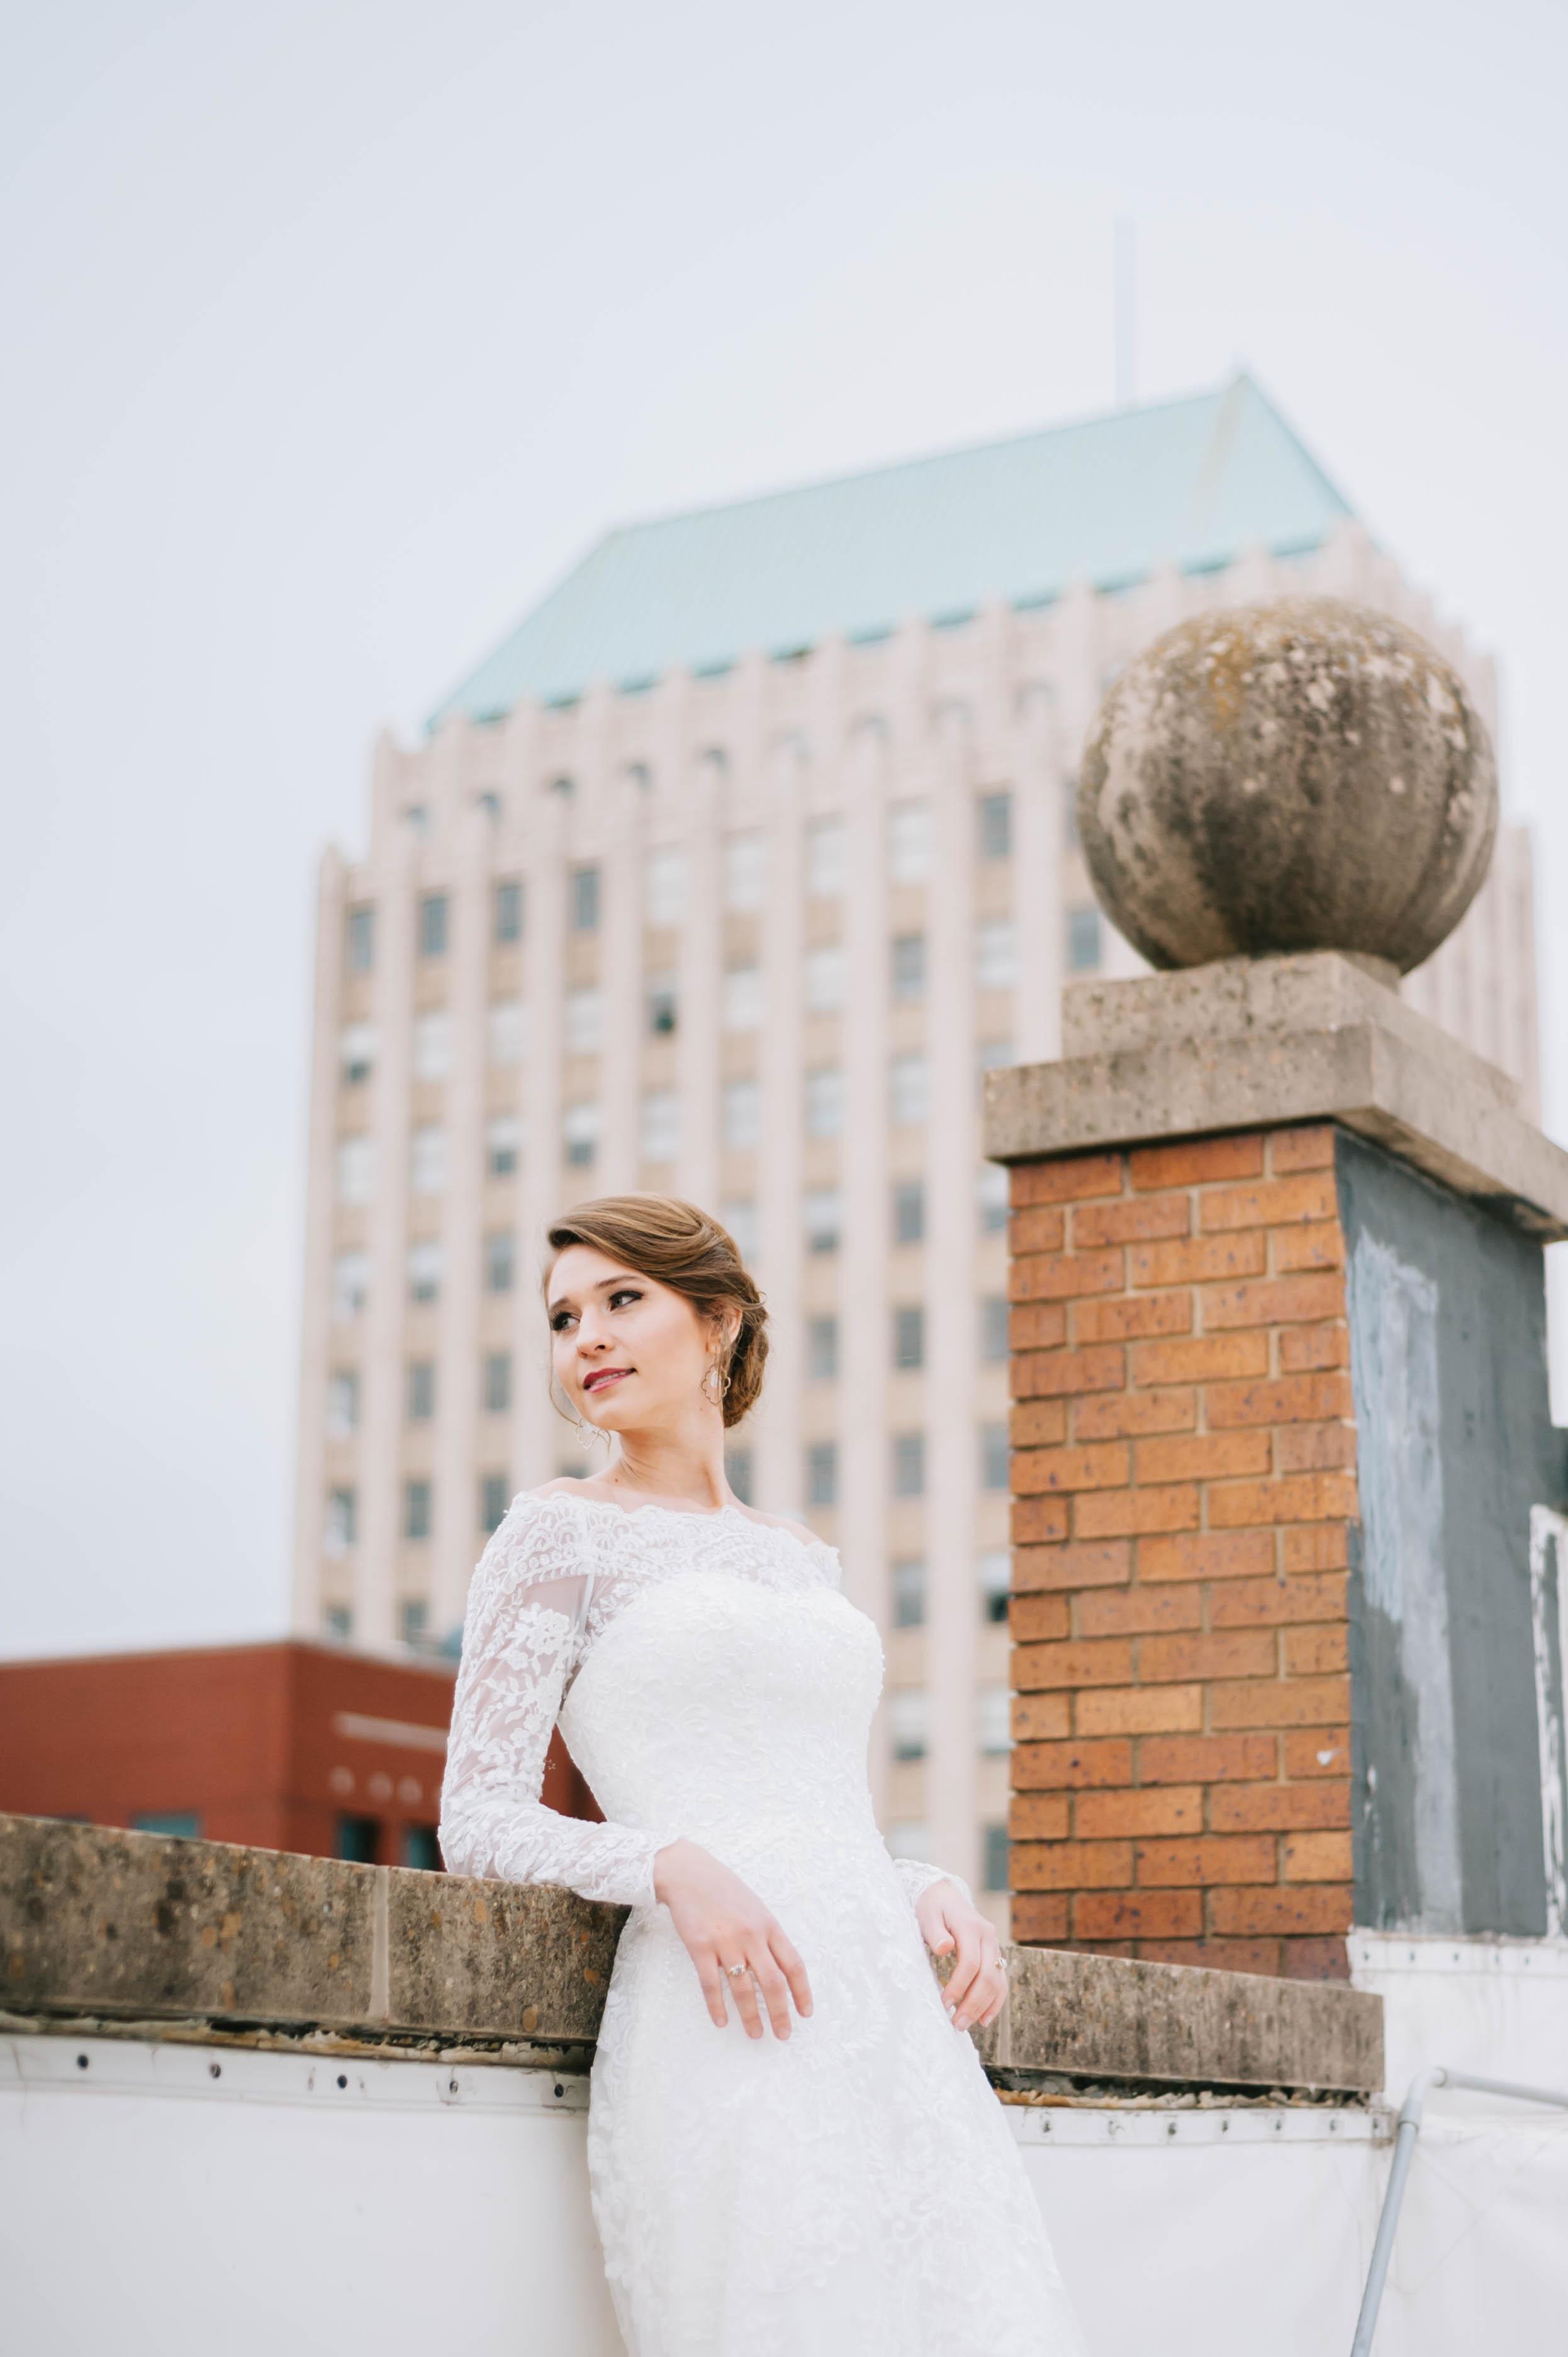 Hannah Steward Baskin | Bridals (72 of 74).jpg